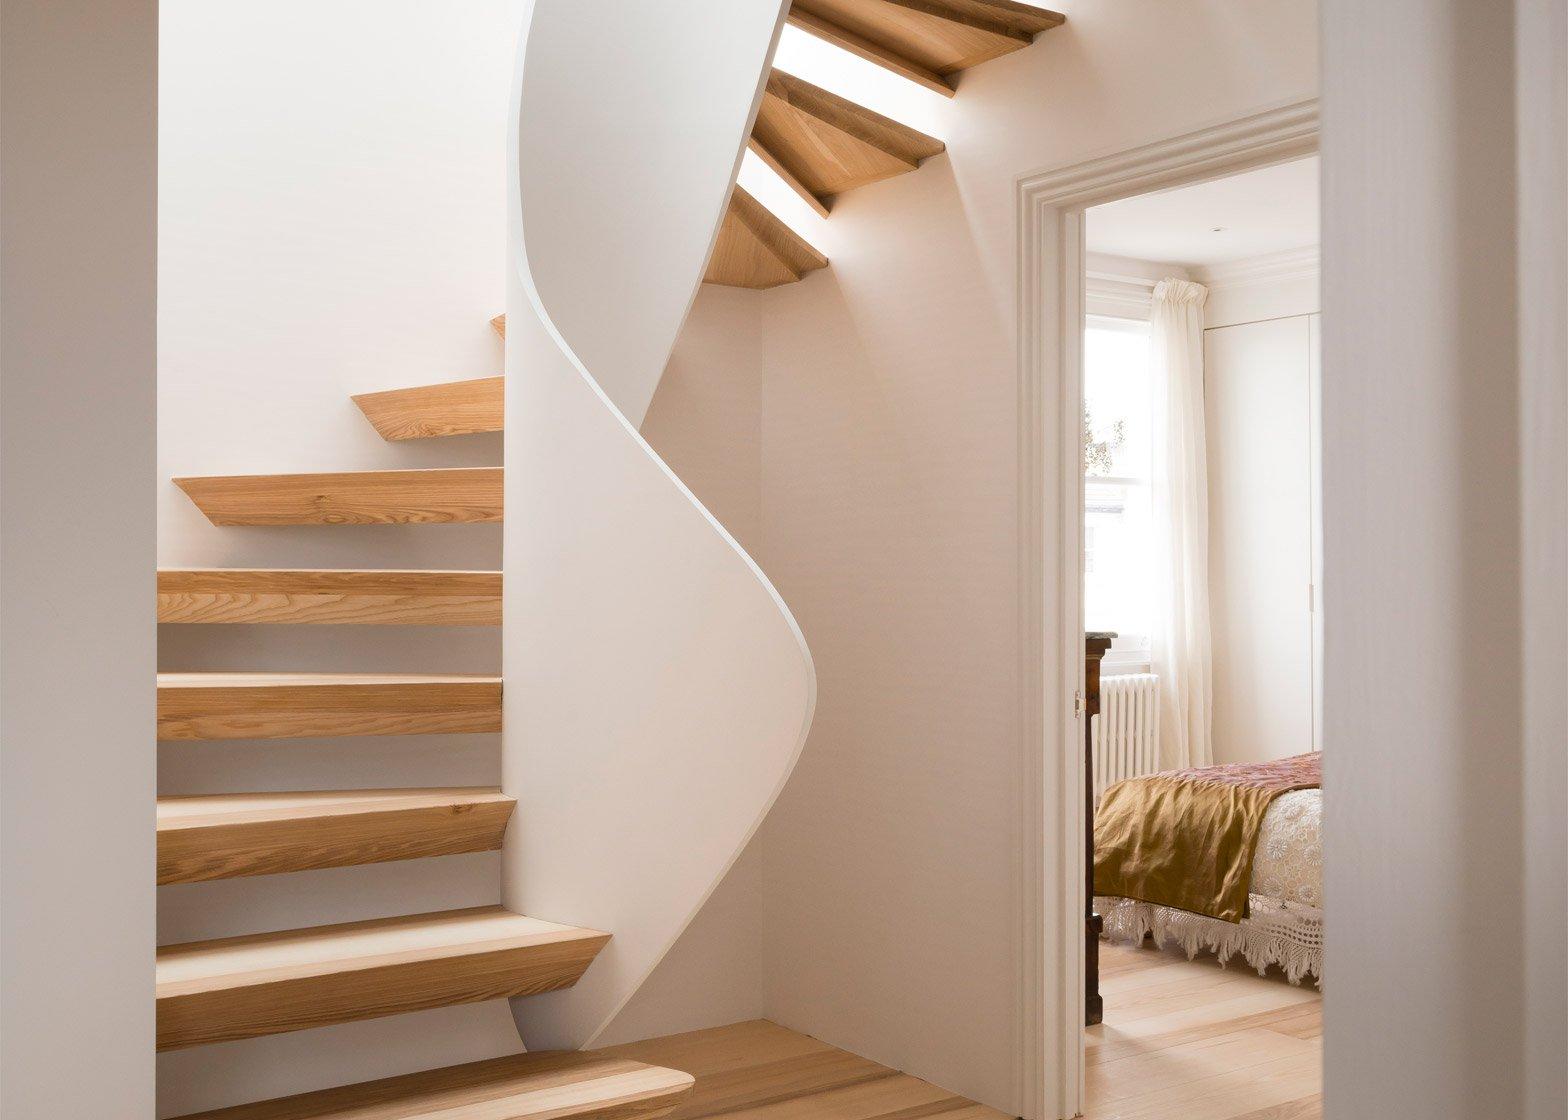 casa-vota-51-architecture-house-london-uk-staircase_dezeen_1568_5